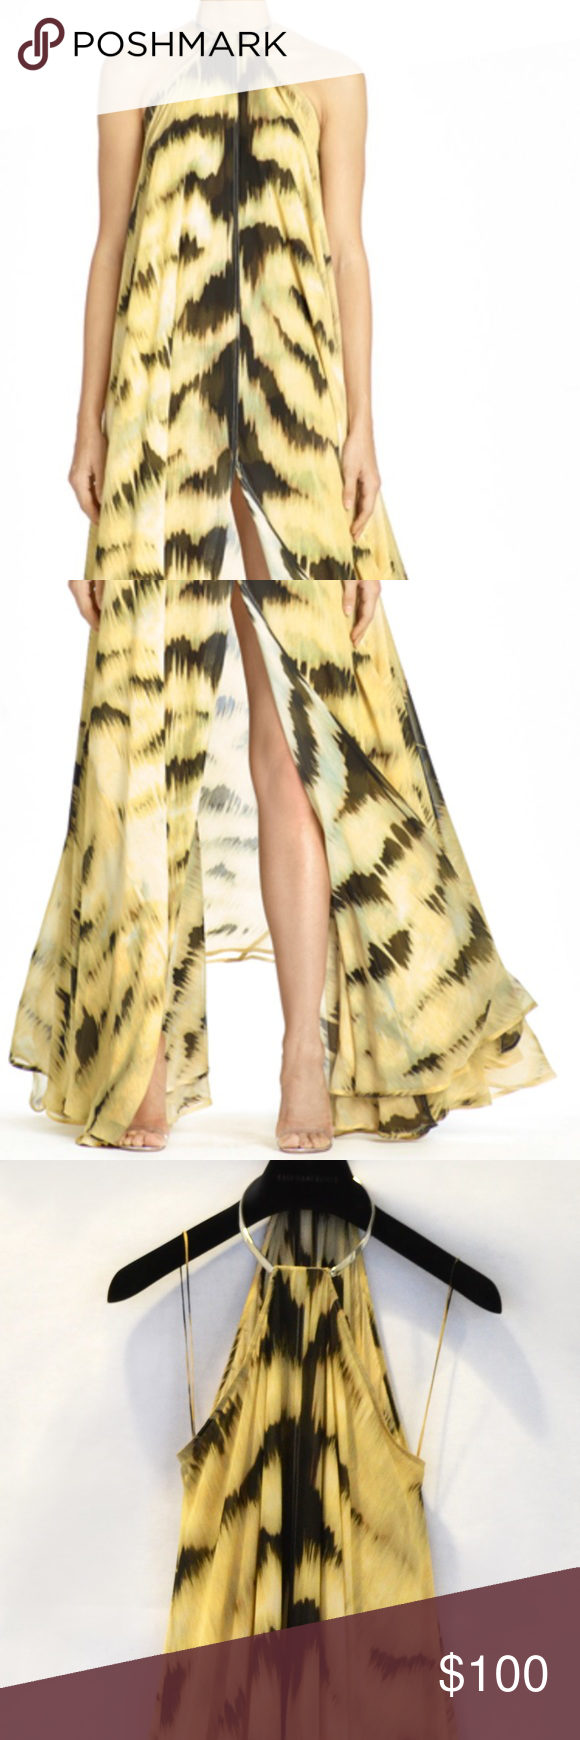 Tiger Chiffon Halter Duster Dress Tiger print, 100% silk. Metal ring neckline detail. KAUFMANFRANCO Dresses Maxi